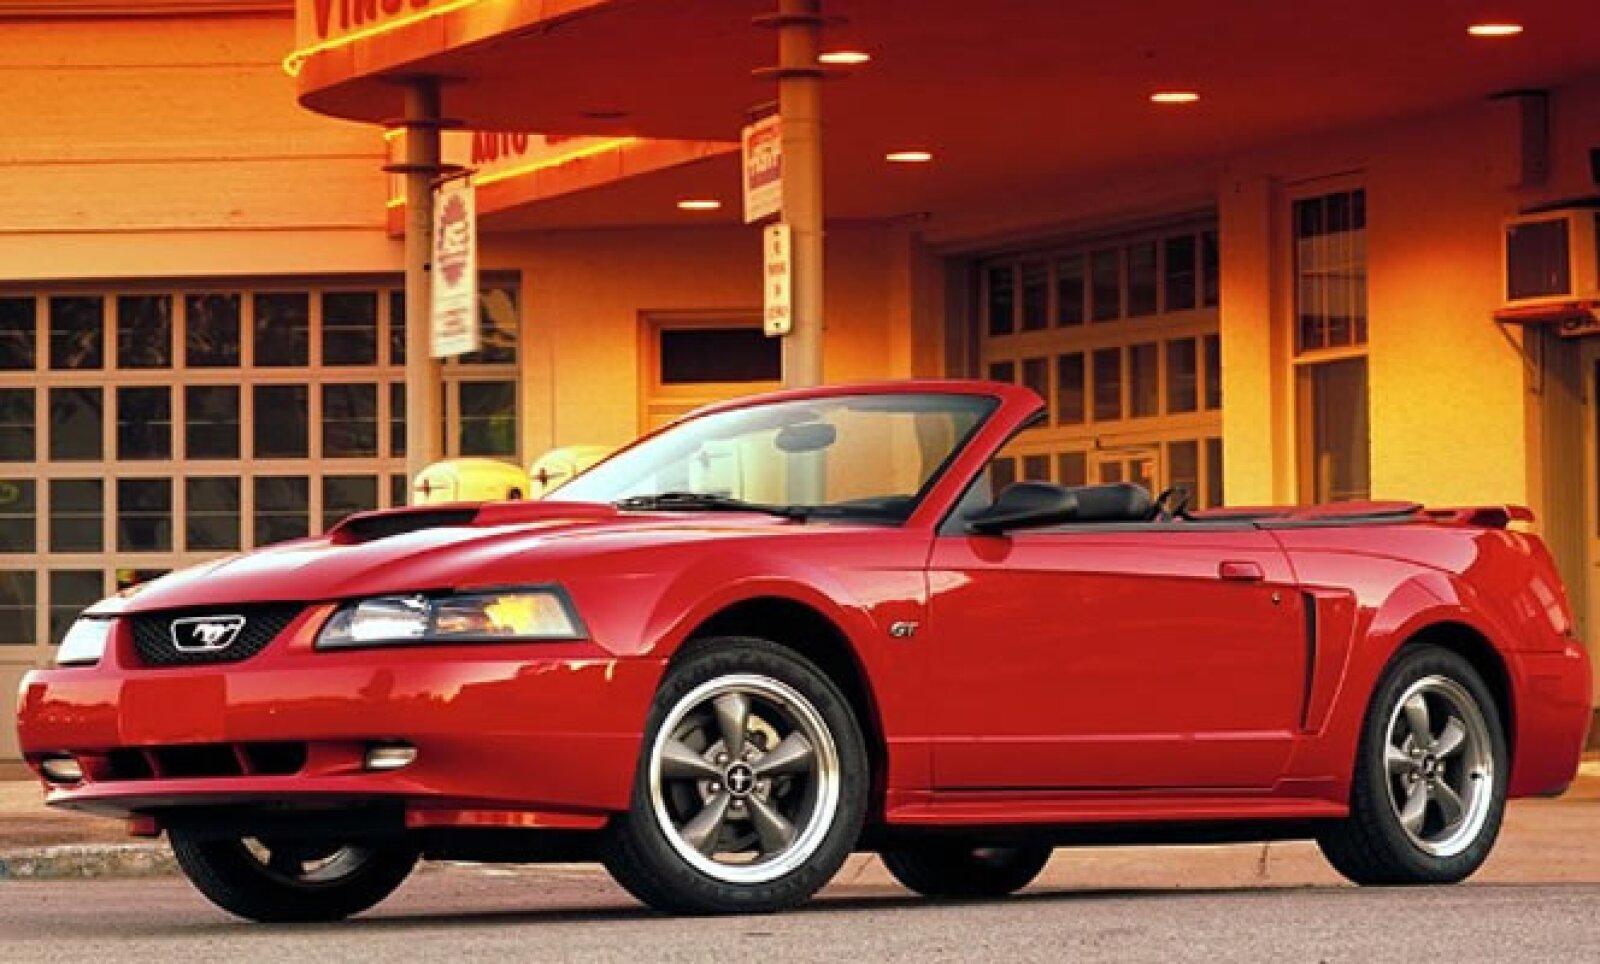 Ford Mustang GT Premium convertible